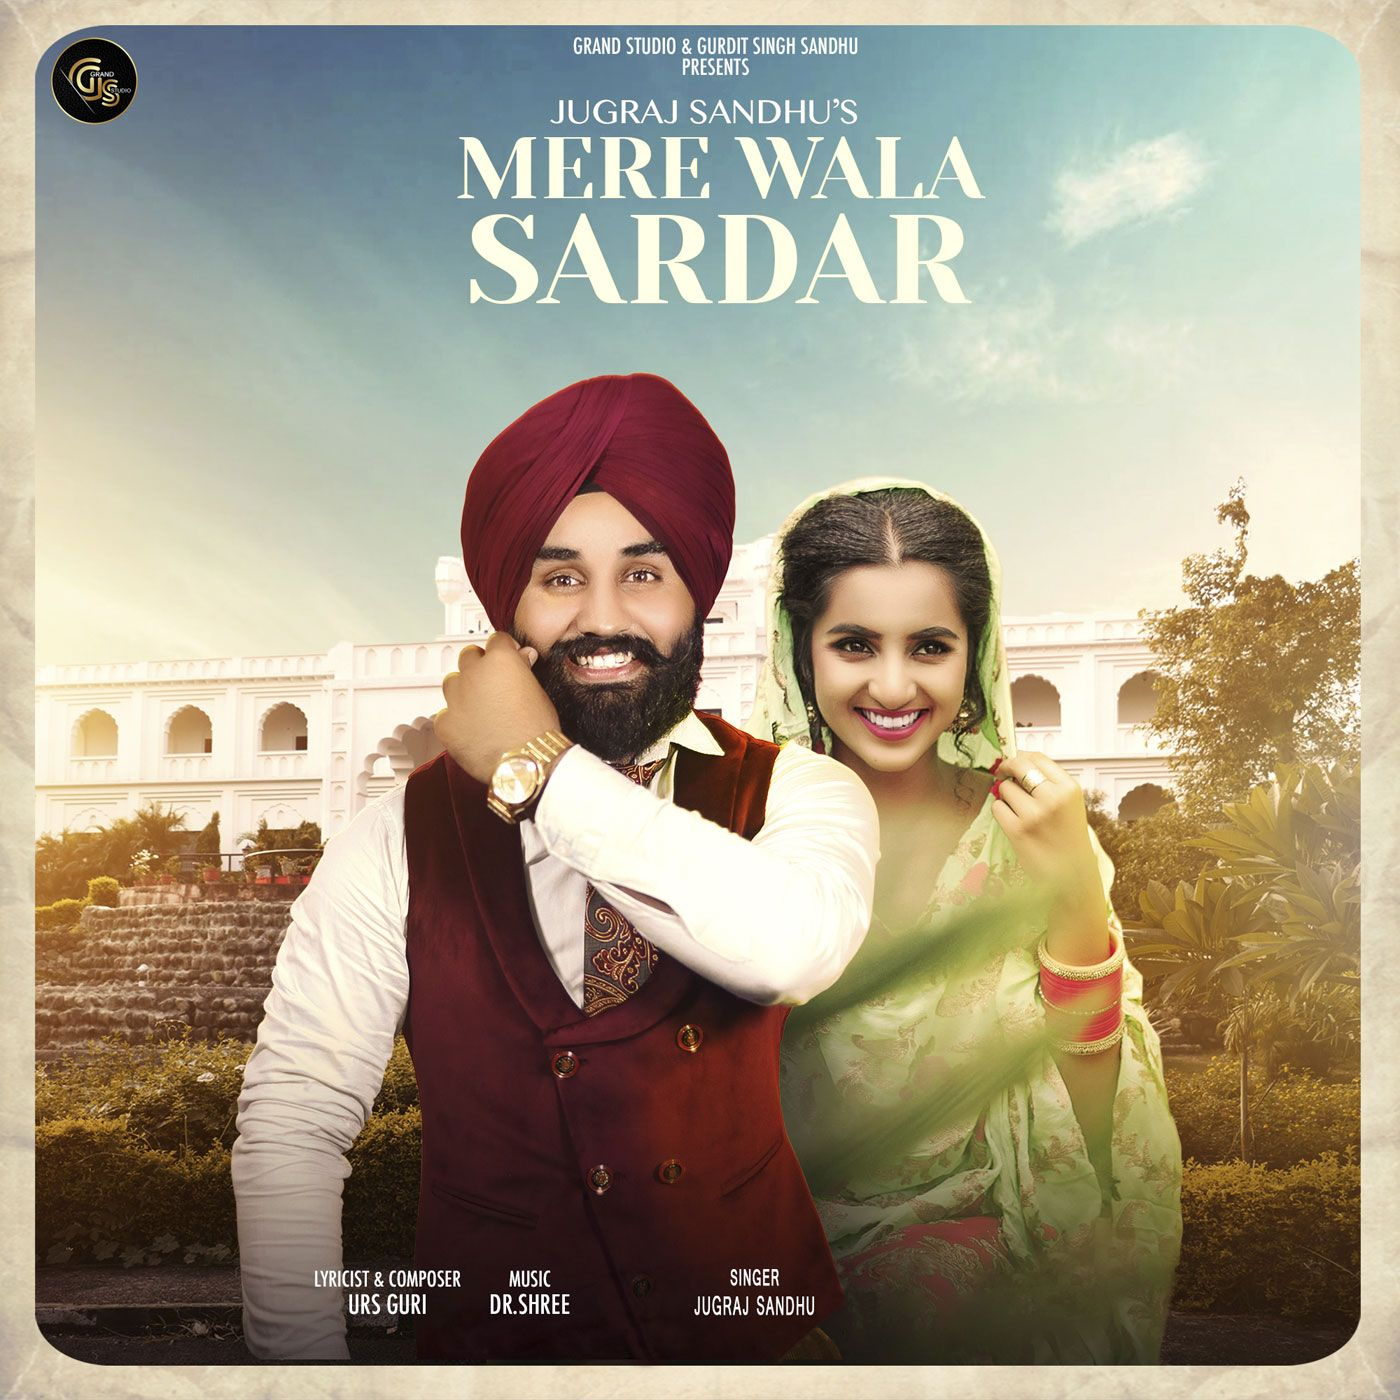 Mere Wala Sardar by Jugraj Sandhu Mp3 song download, Mp3